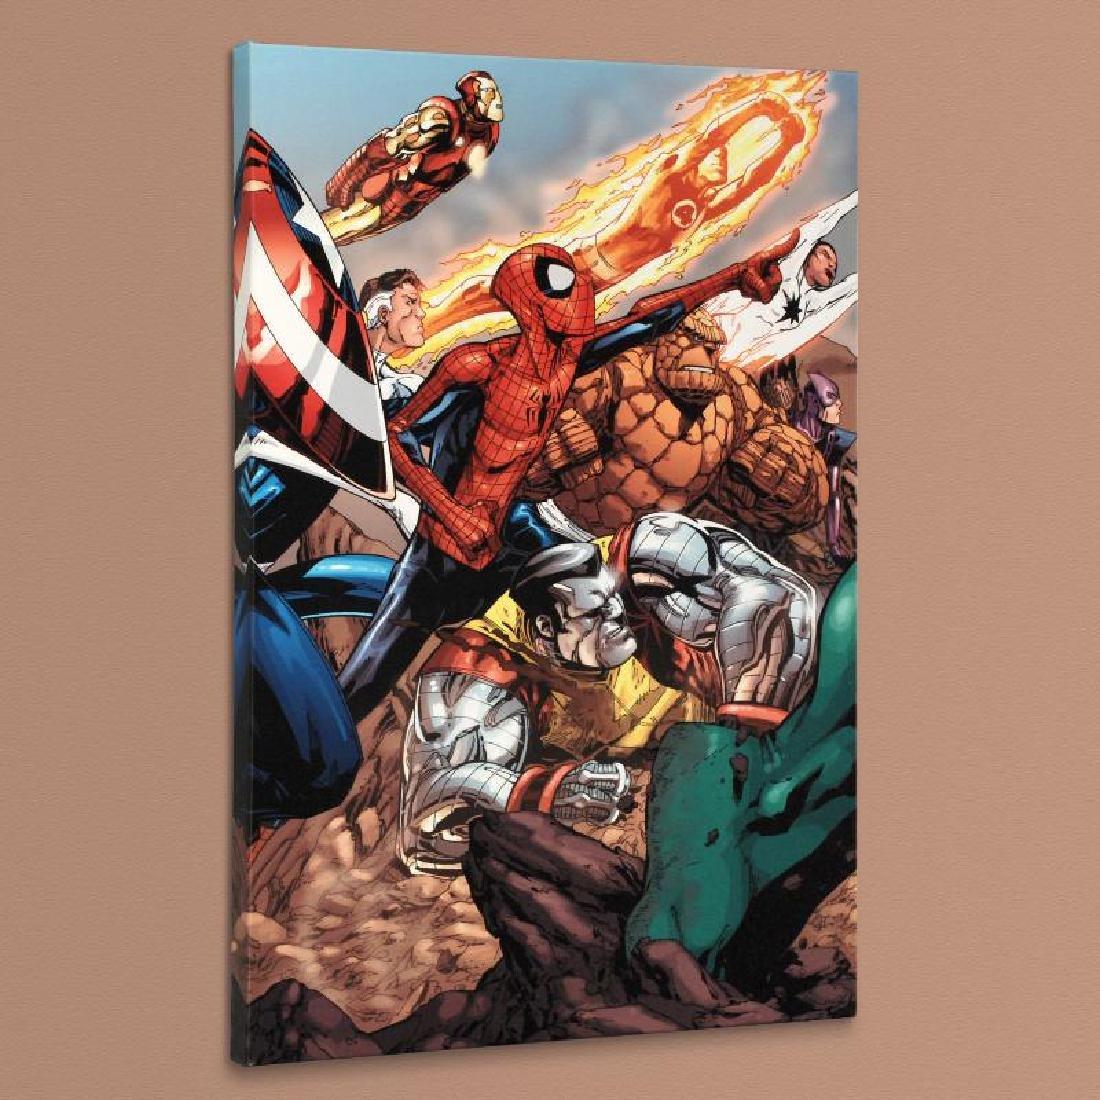 """Spider-Man & The Secret Wars #3"" Limited Edition"